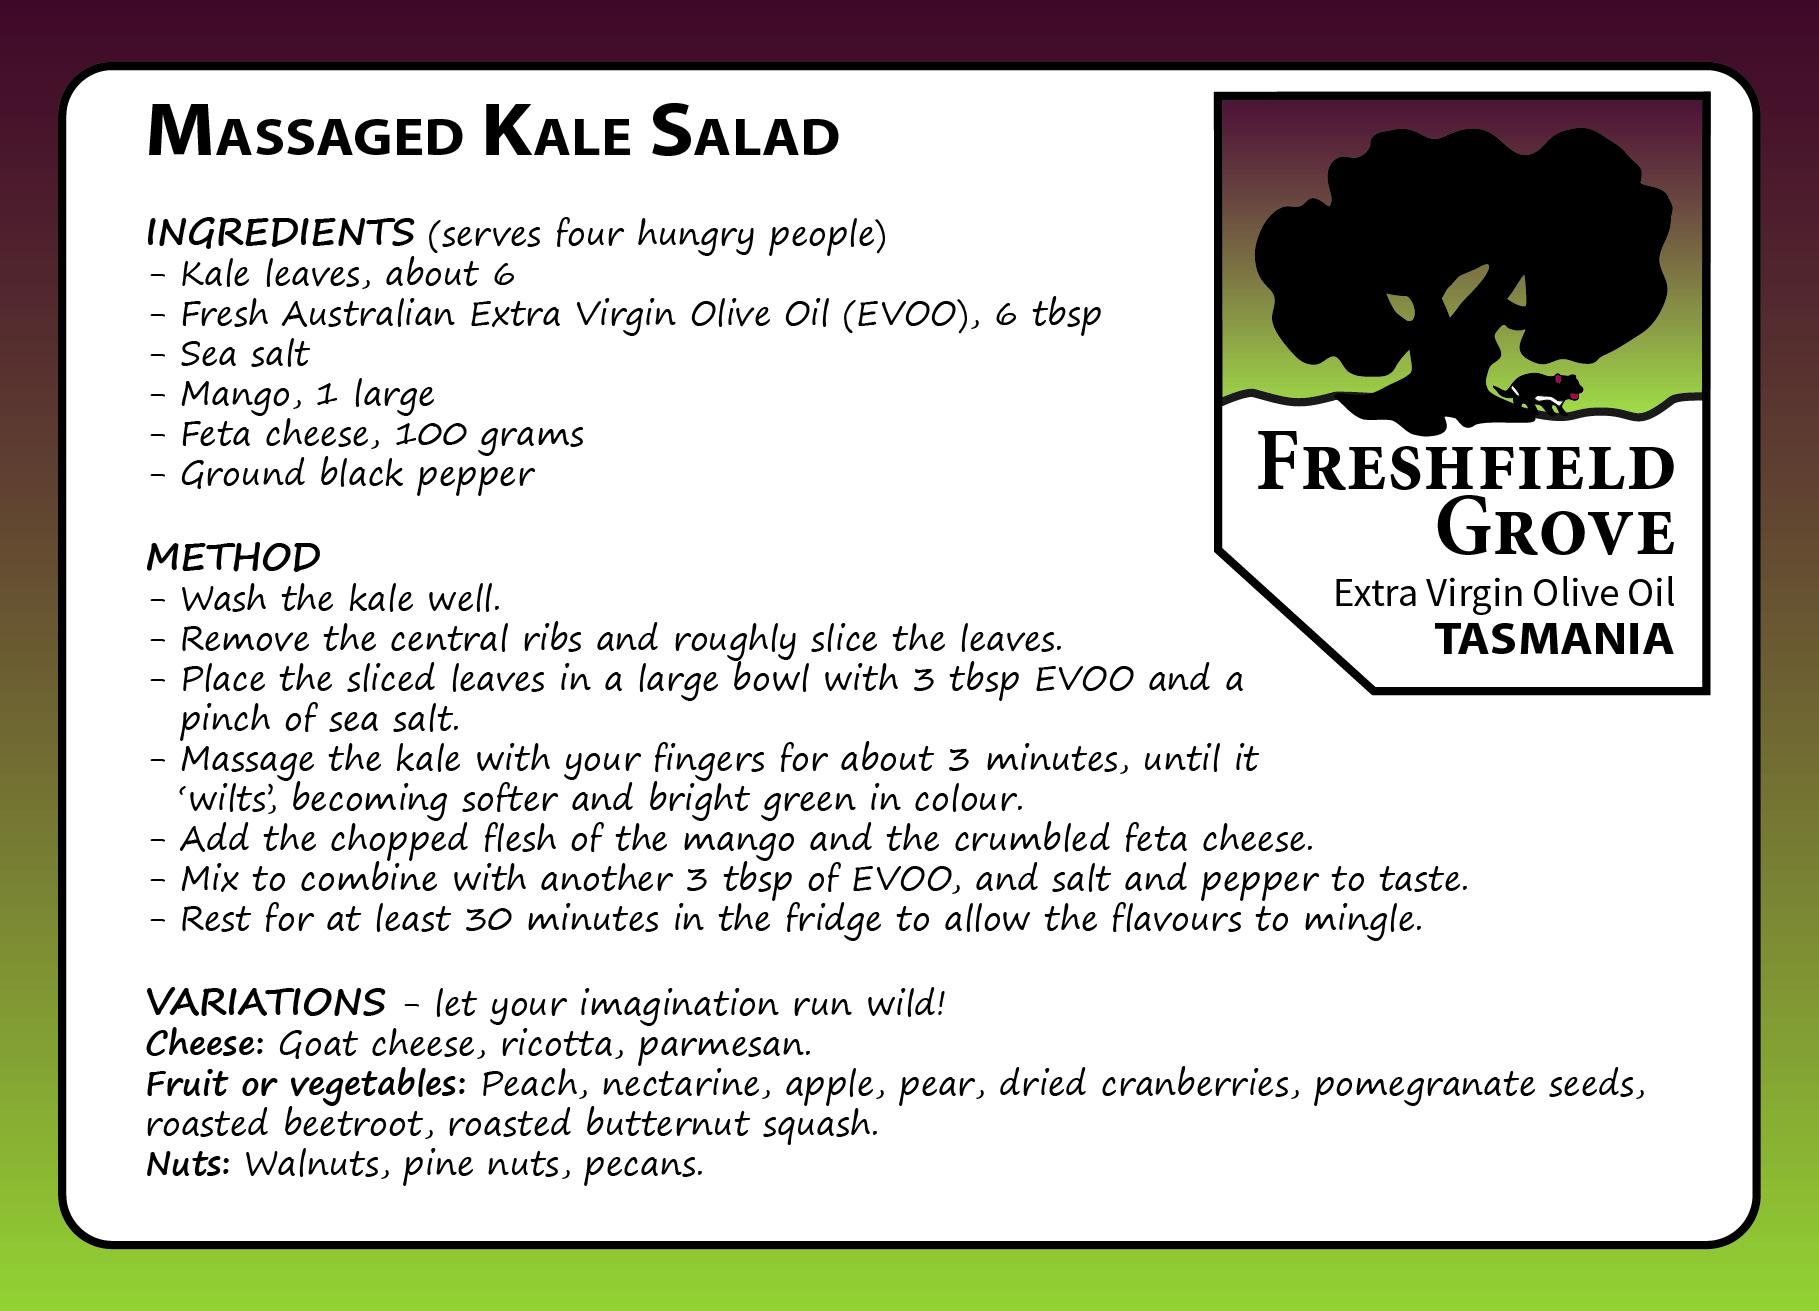 massaged kale salad evoo mango feta